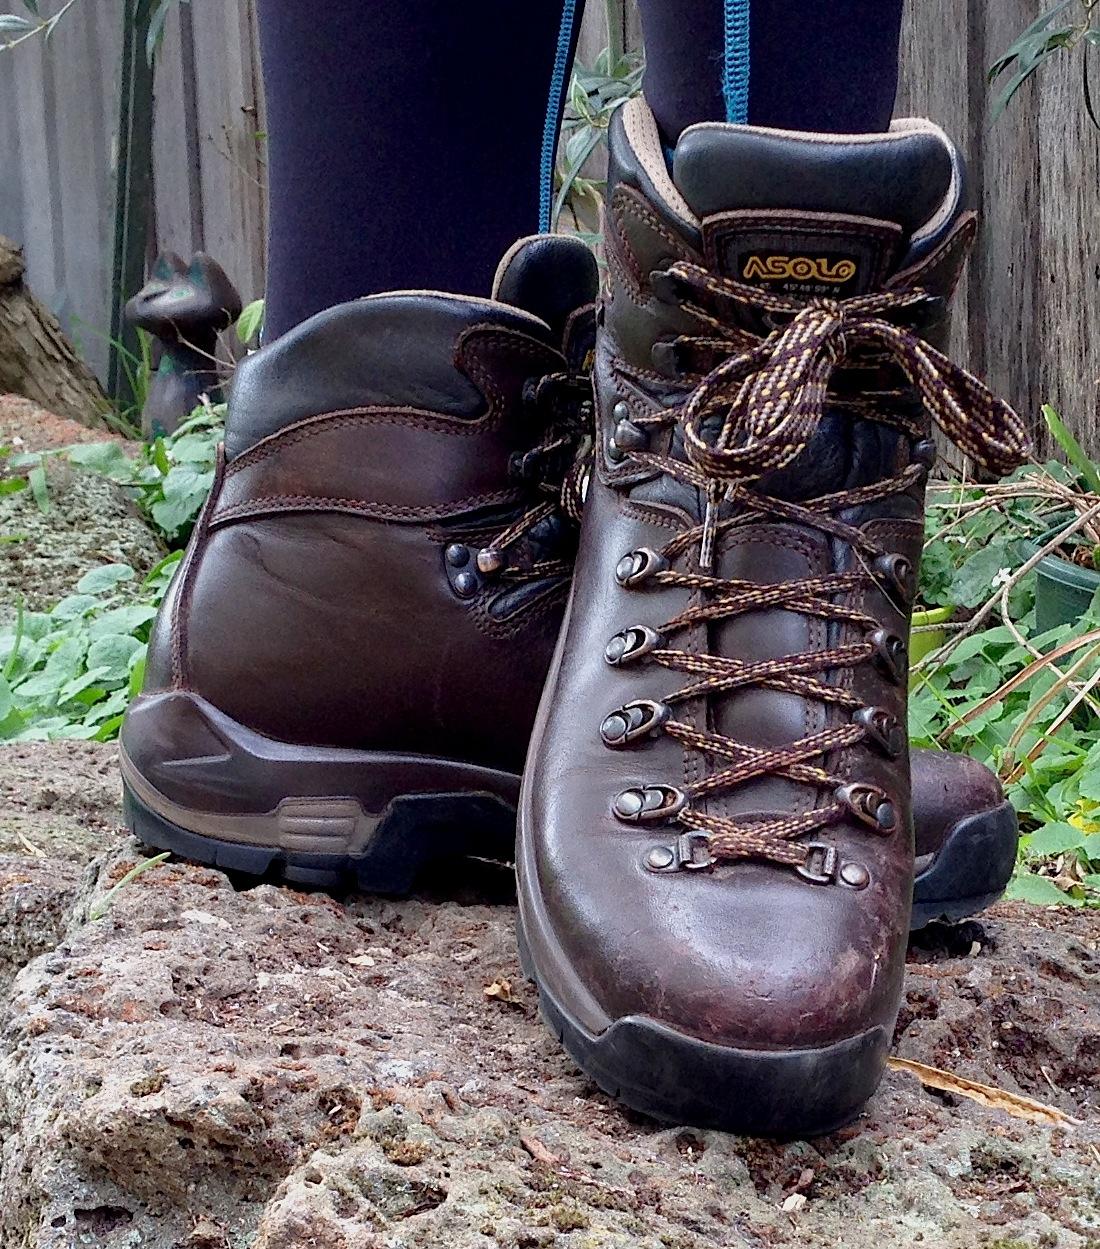 9baf344b0ed Asolo TPS 520 GV Women s Hiking Boots — Princess Wears Hiking Boots